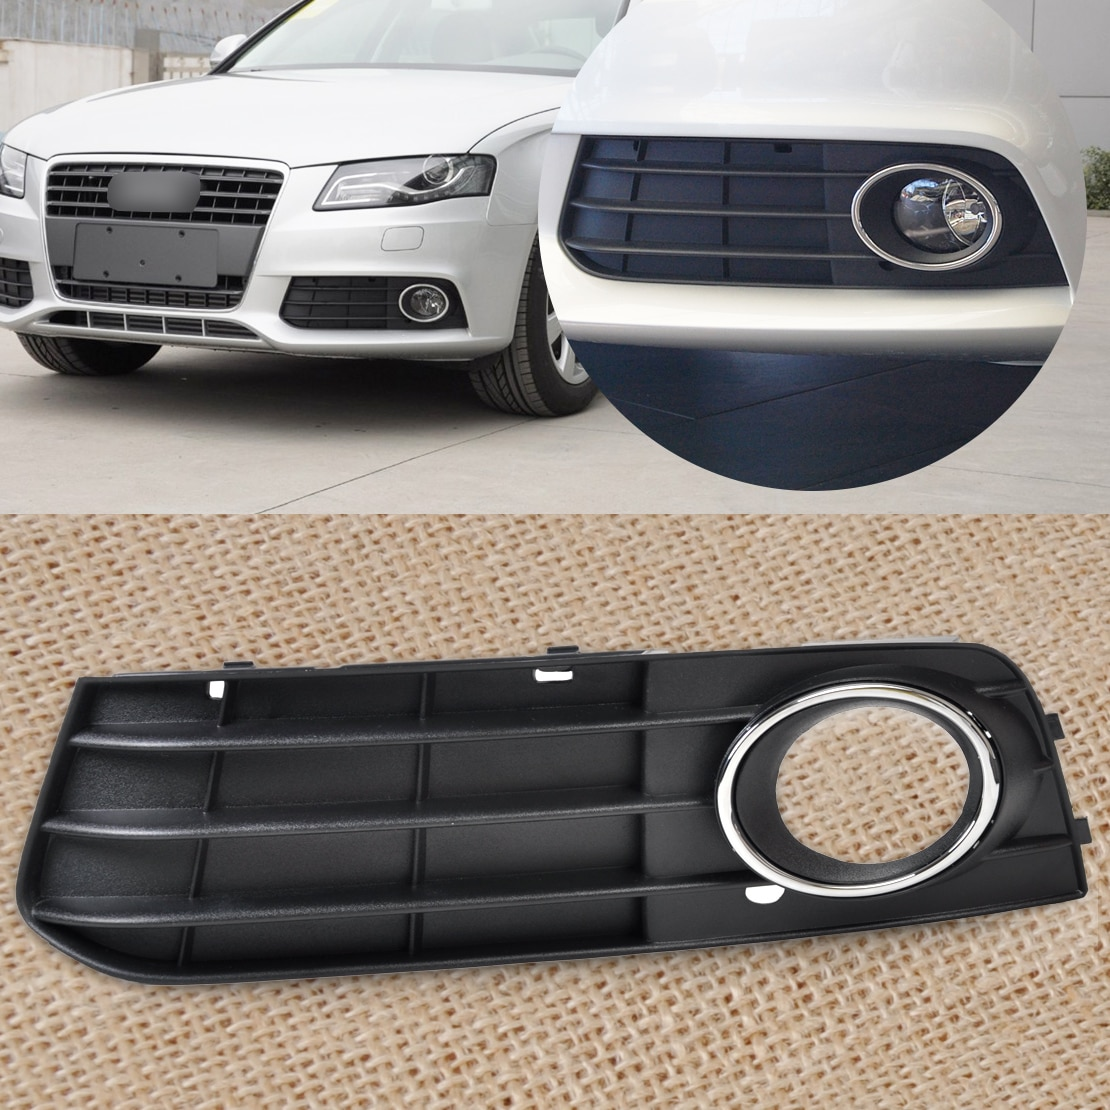 DWCX New Black Left Fog Light Lamp Cover Grille 8K0 807 681 A 01C 8K0807681A 01C 1pc for Audi A4 B8 2008 2009 2010 2011 2012